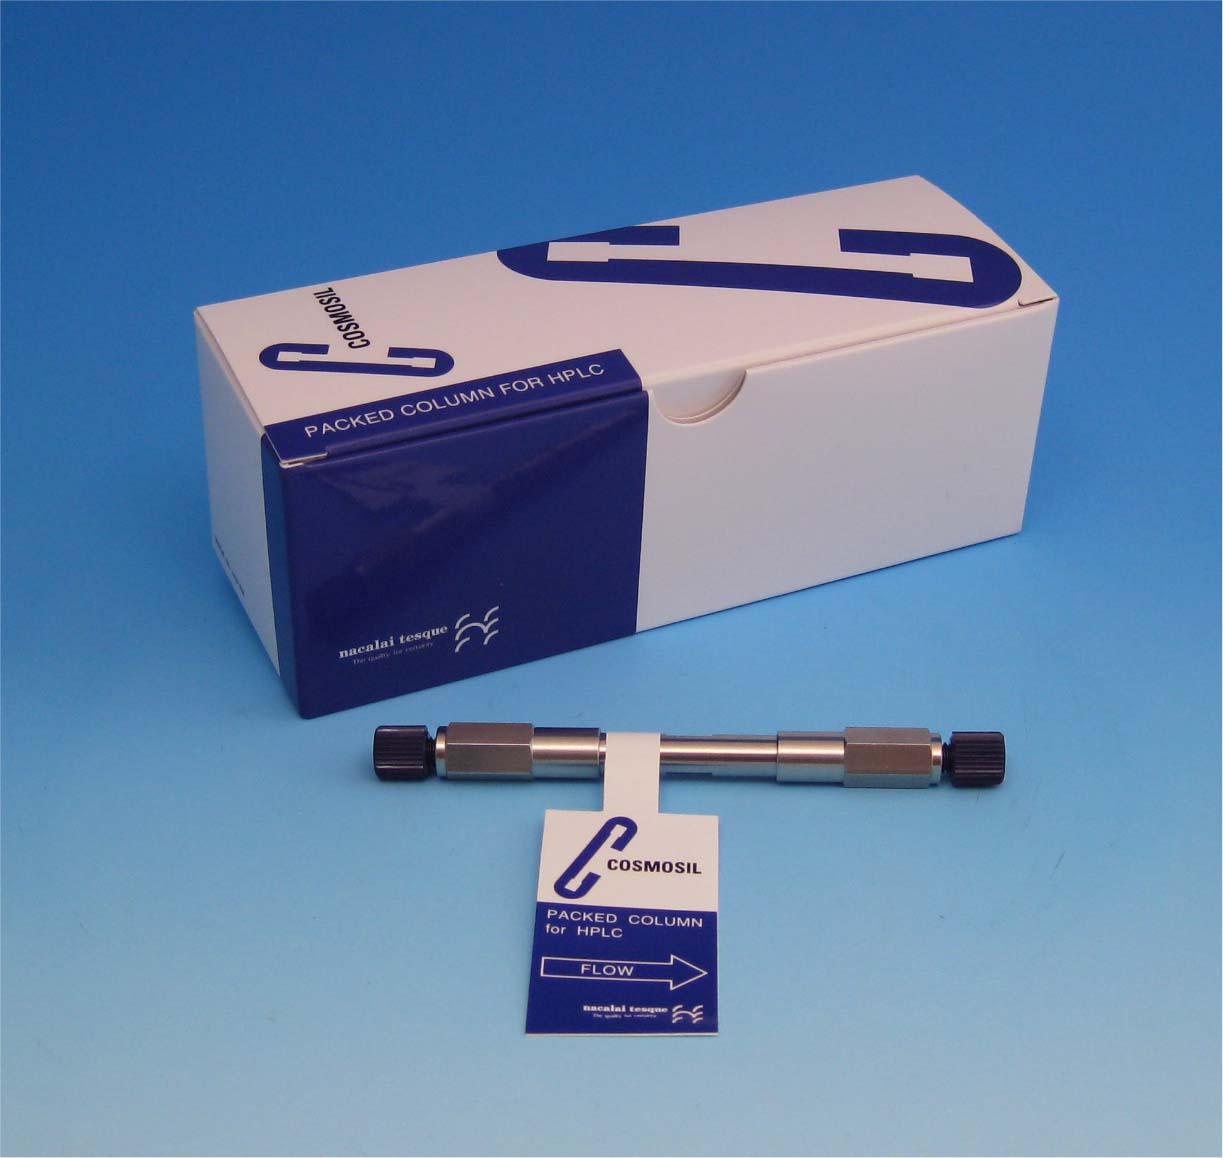 COSMOSIL(R) 5C18-MS-Ⅱ Packed Column 1.0mmI.D.x50mm